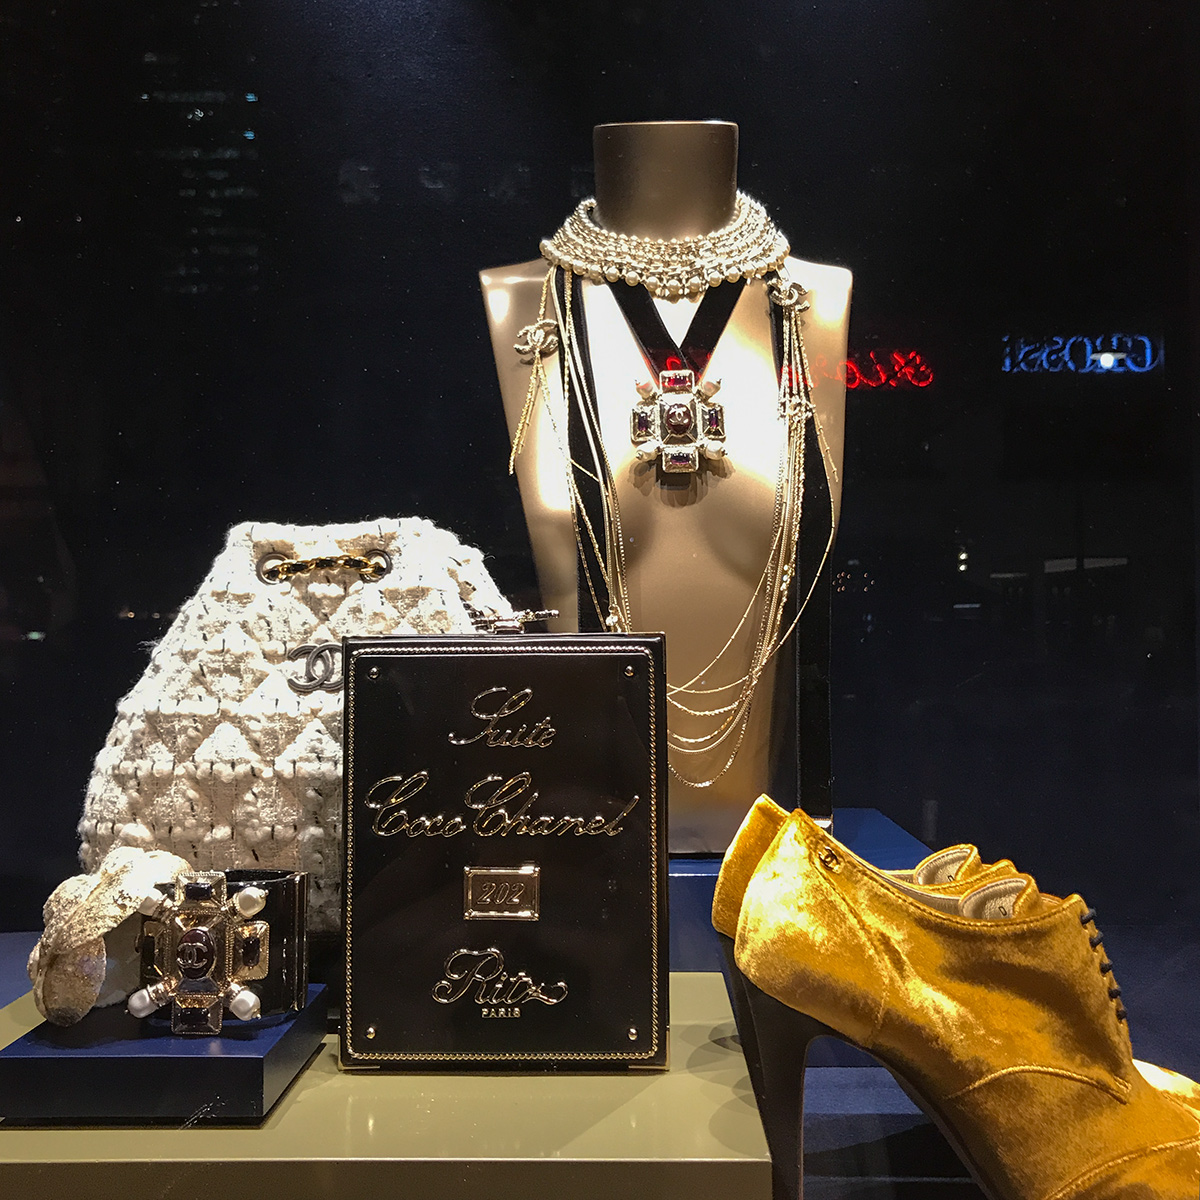 Stylesnooperdan-Chanel-at-Marais-Melbourne-14.jpg